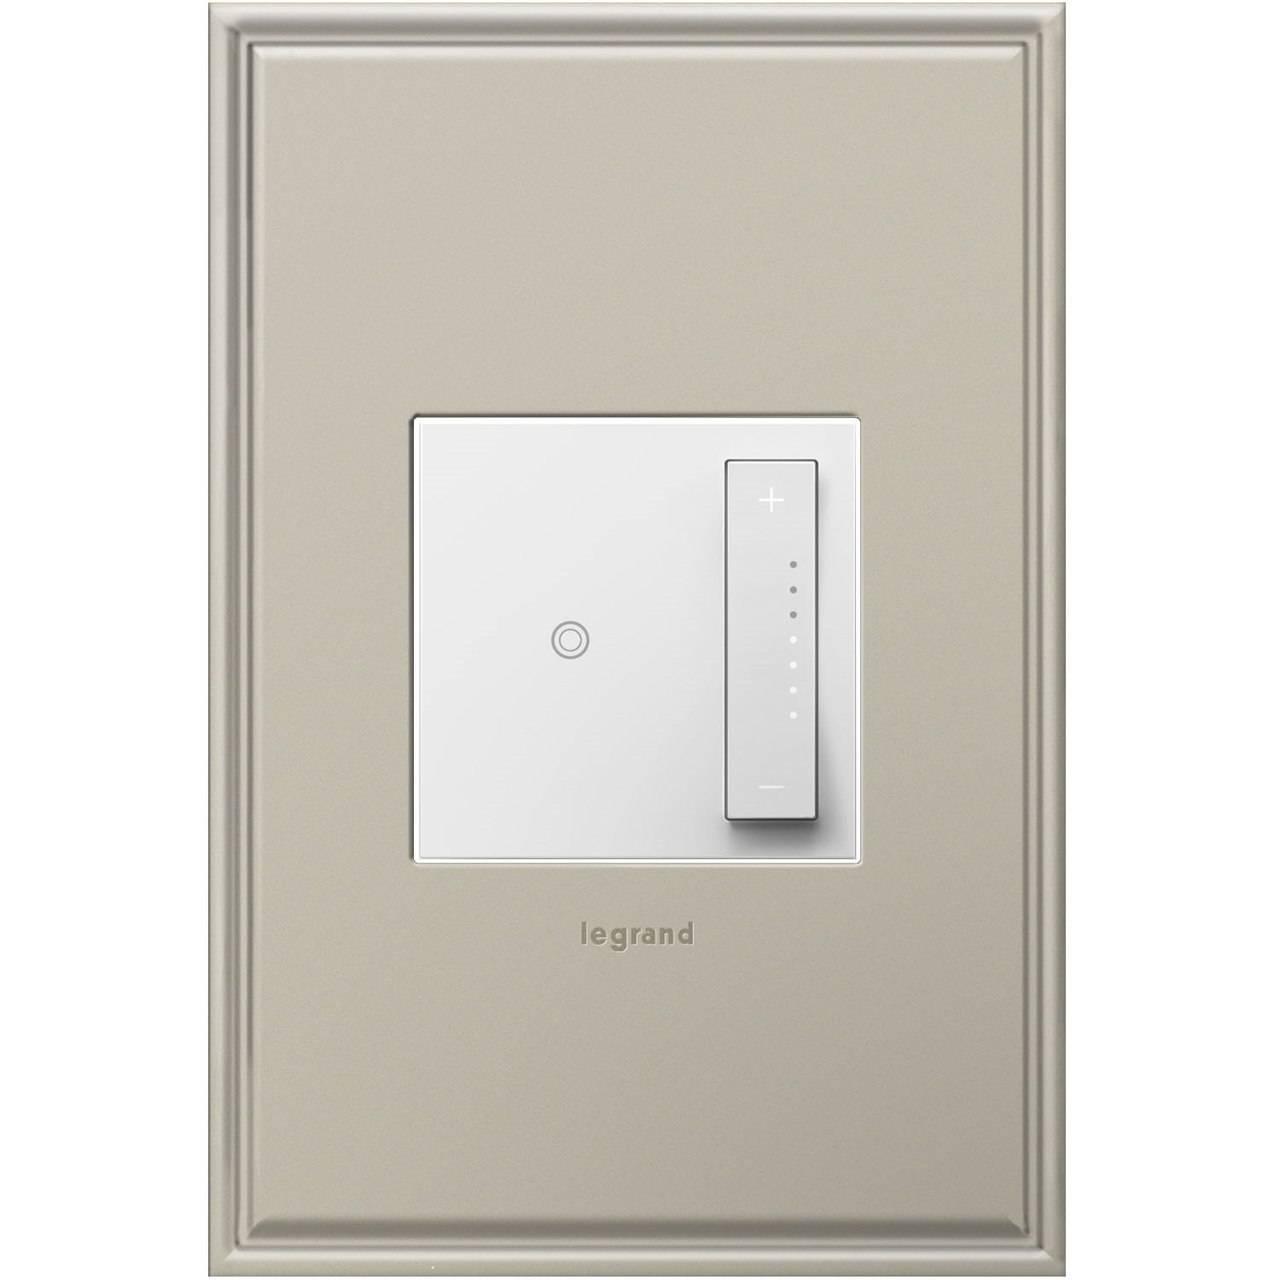 Legrand adorne softap dimmer tru-universal dimmer switch at Brand Lighting